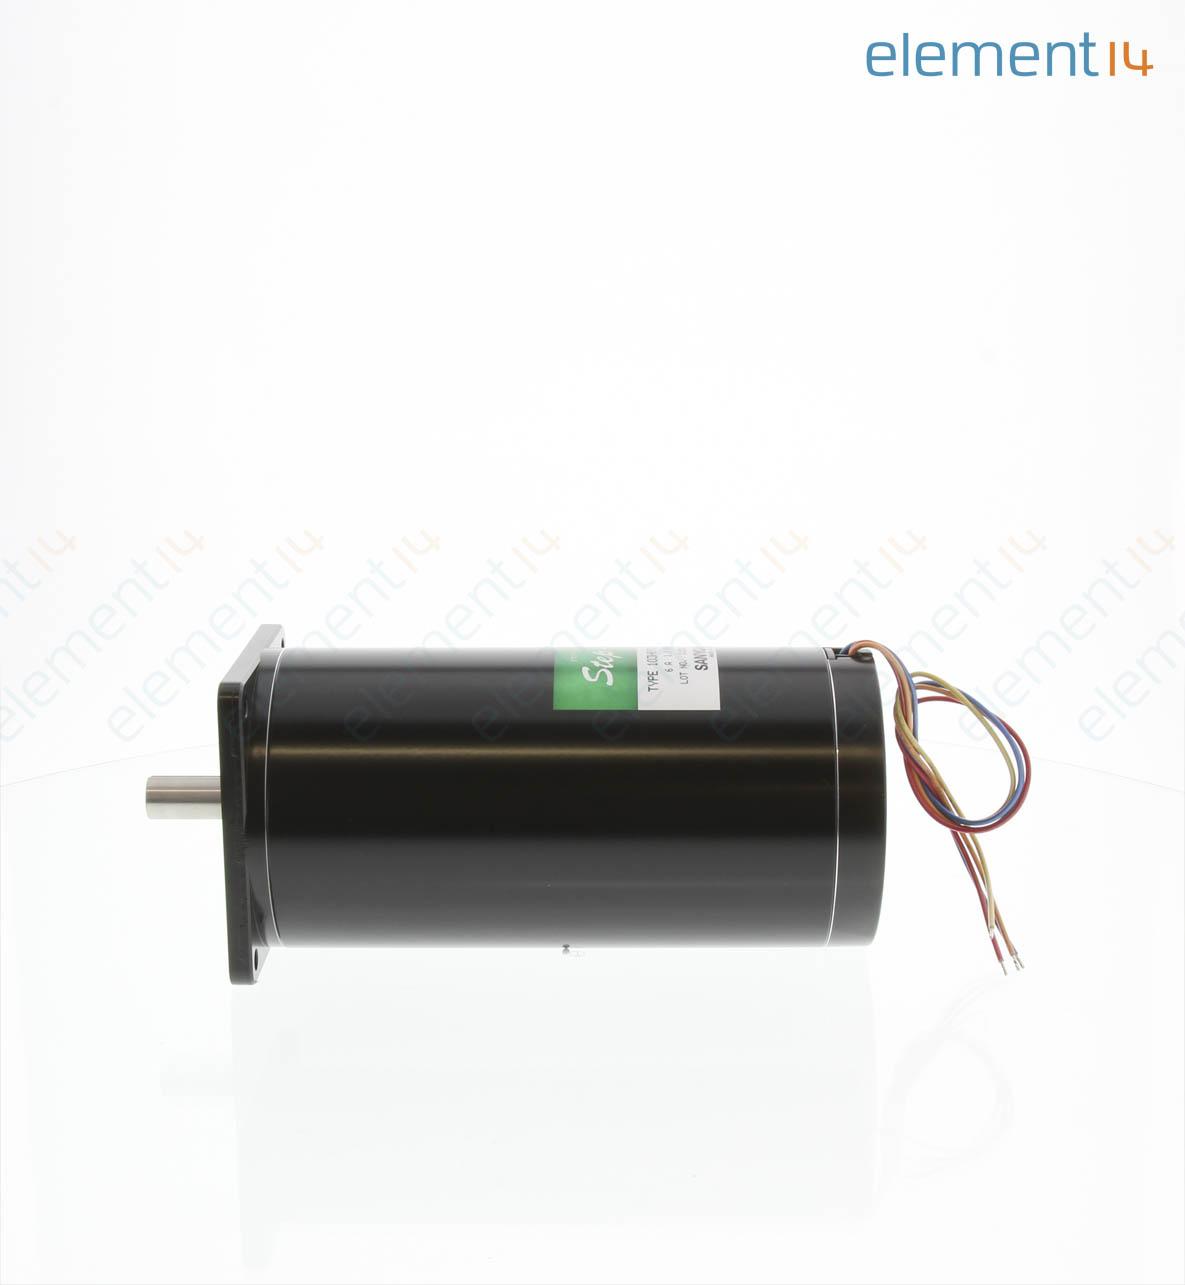 103h89223 5241 Sanyo Denki Sanmotion Stepper Motor